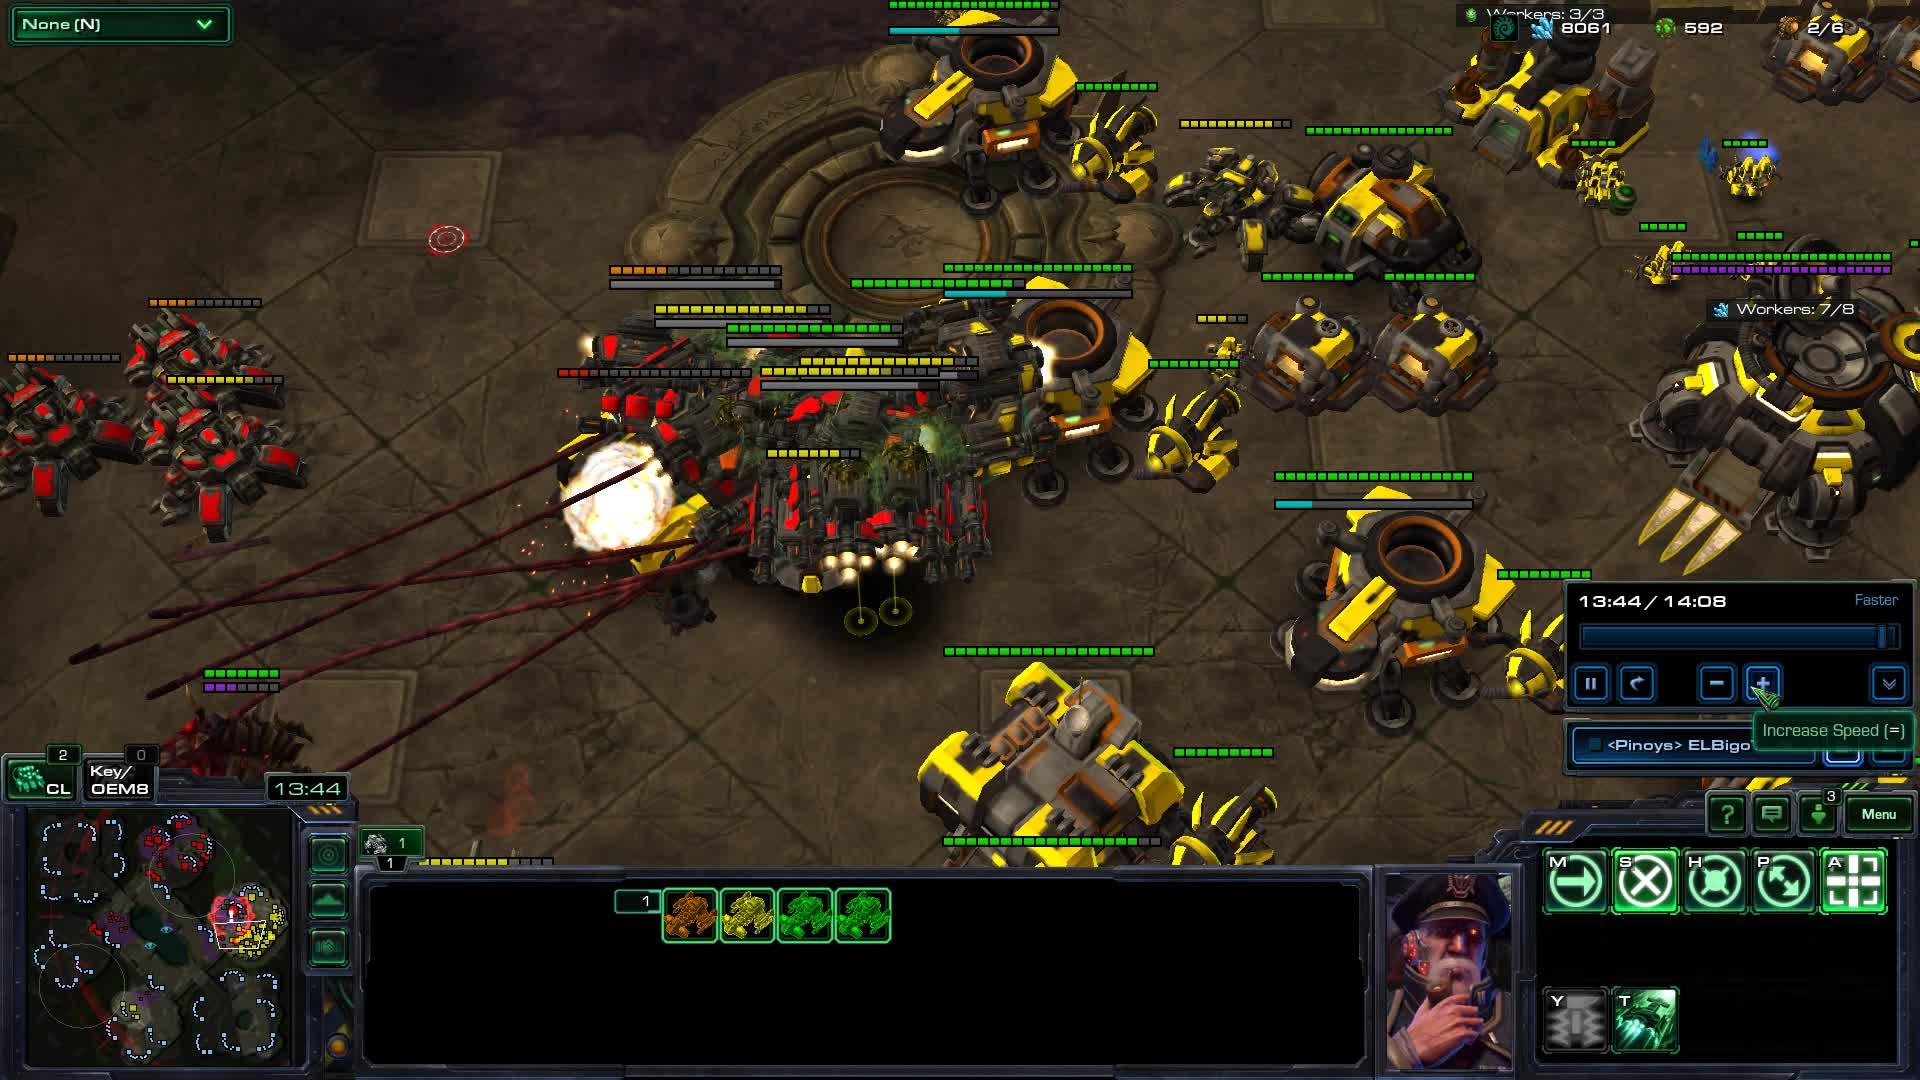 StarCraft II 2018.04.28 - 08.56.06.01 GIFs